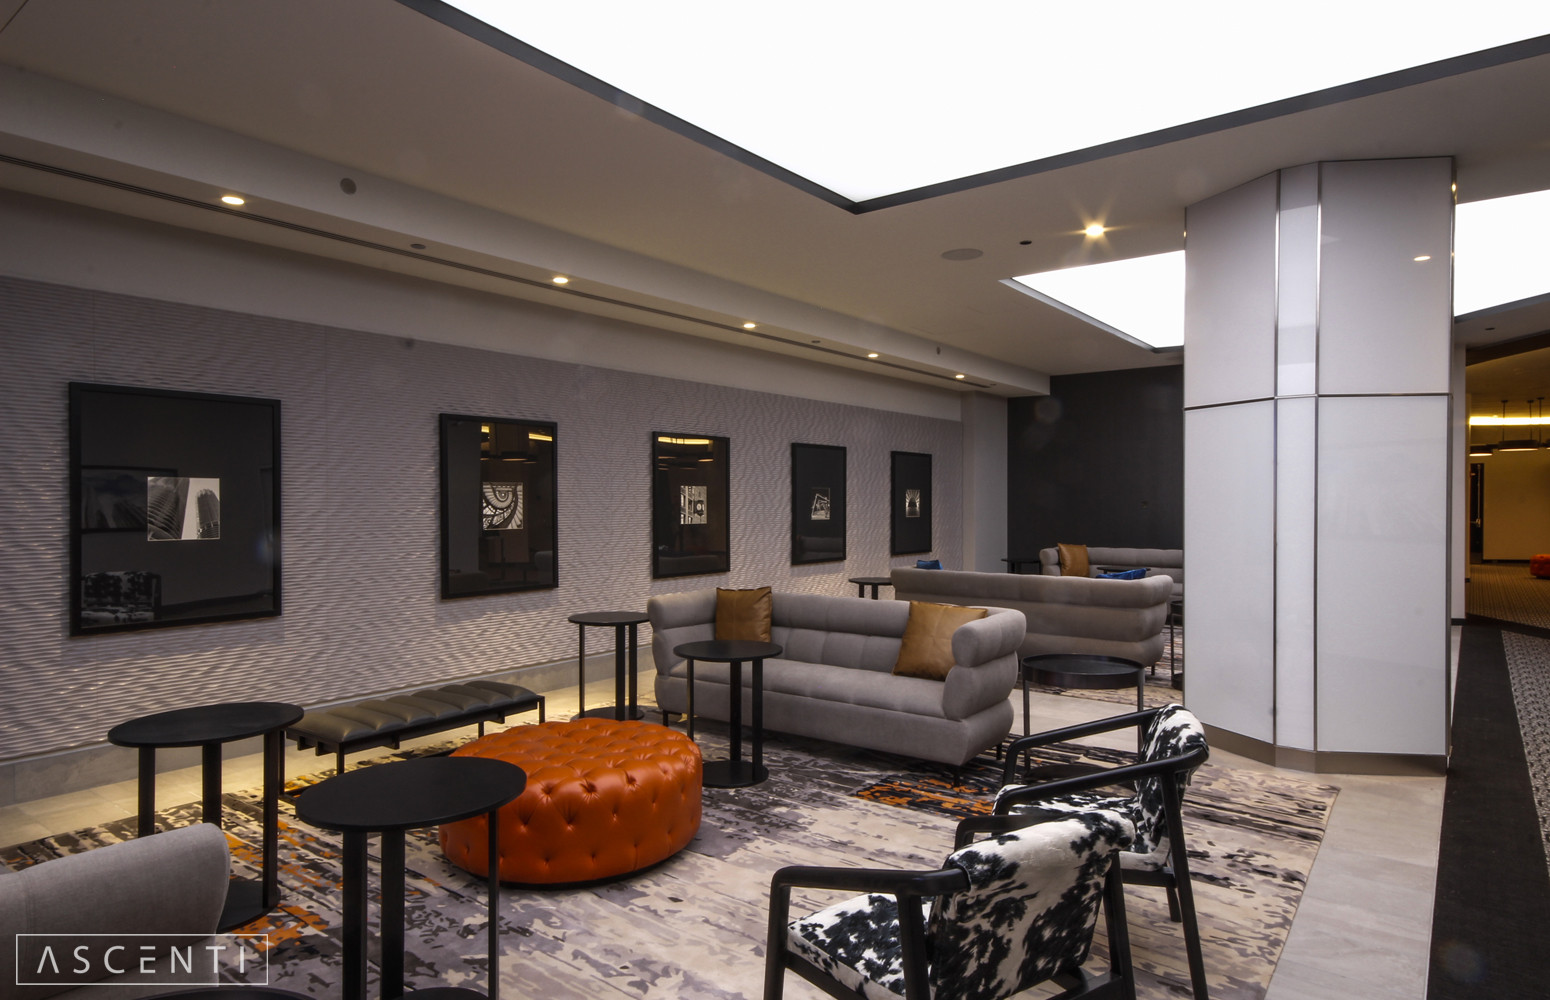 Hotel_Chicago_2wm_ascenti_lighting.jpg